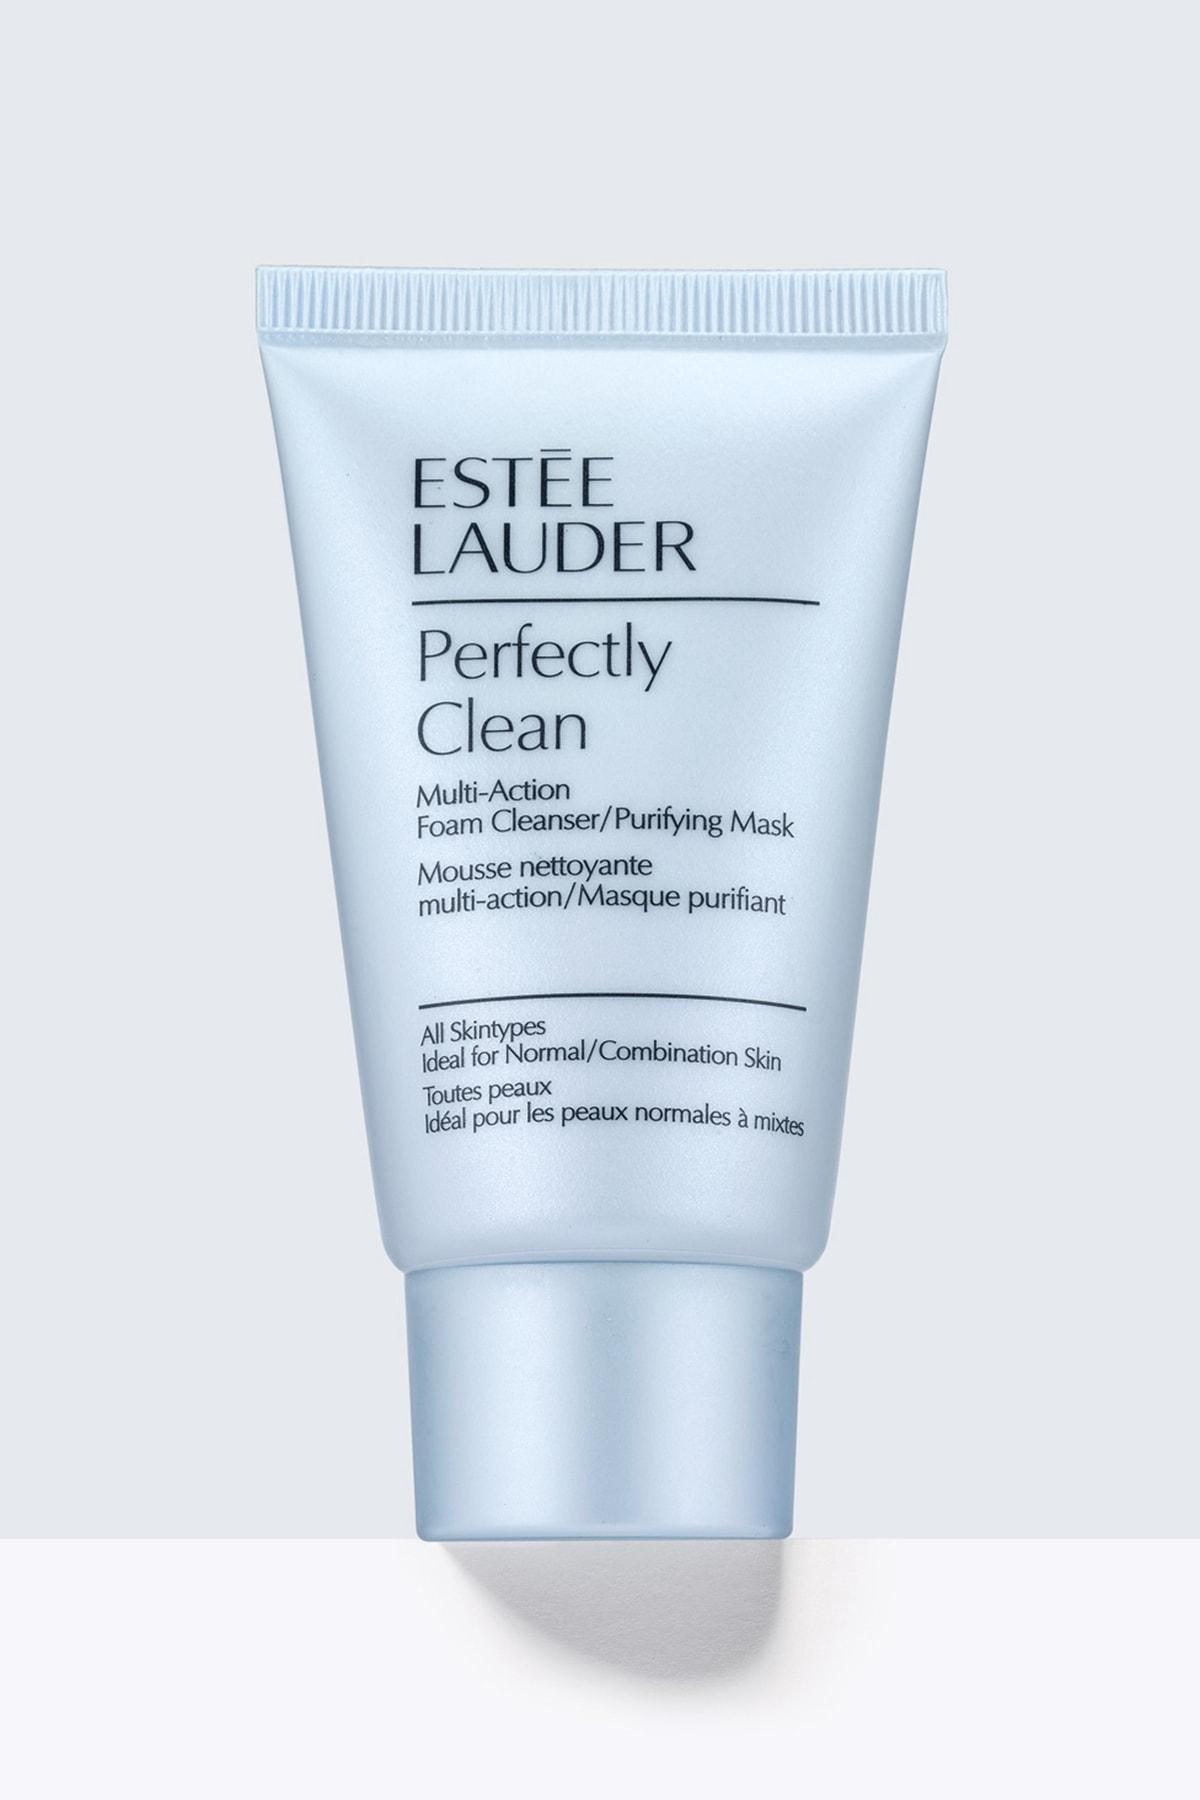 Estee Lauder Seyahat Boy Yüz Yıkama Köpüğü - Perfectly Clean Foaming Cleanser 30ml 887167190580 1